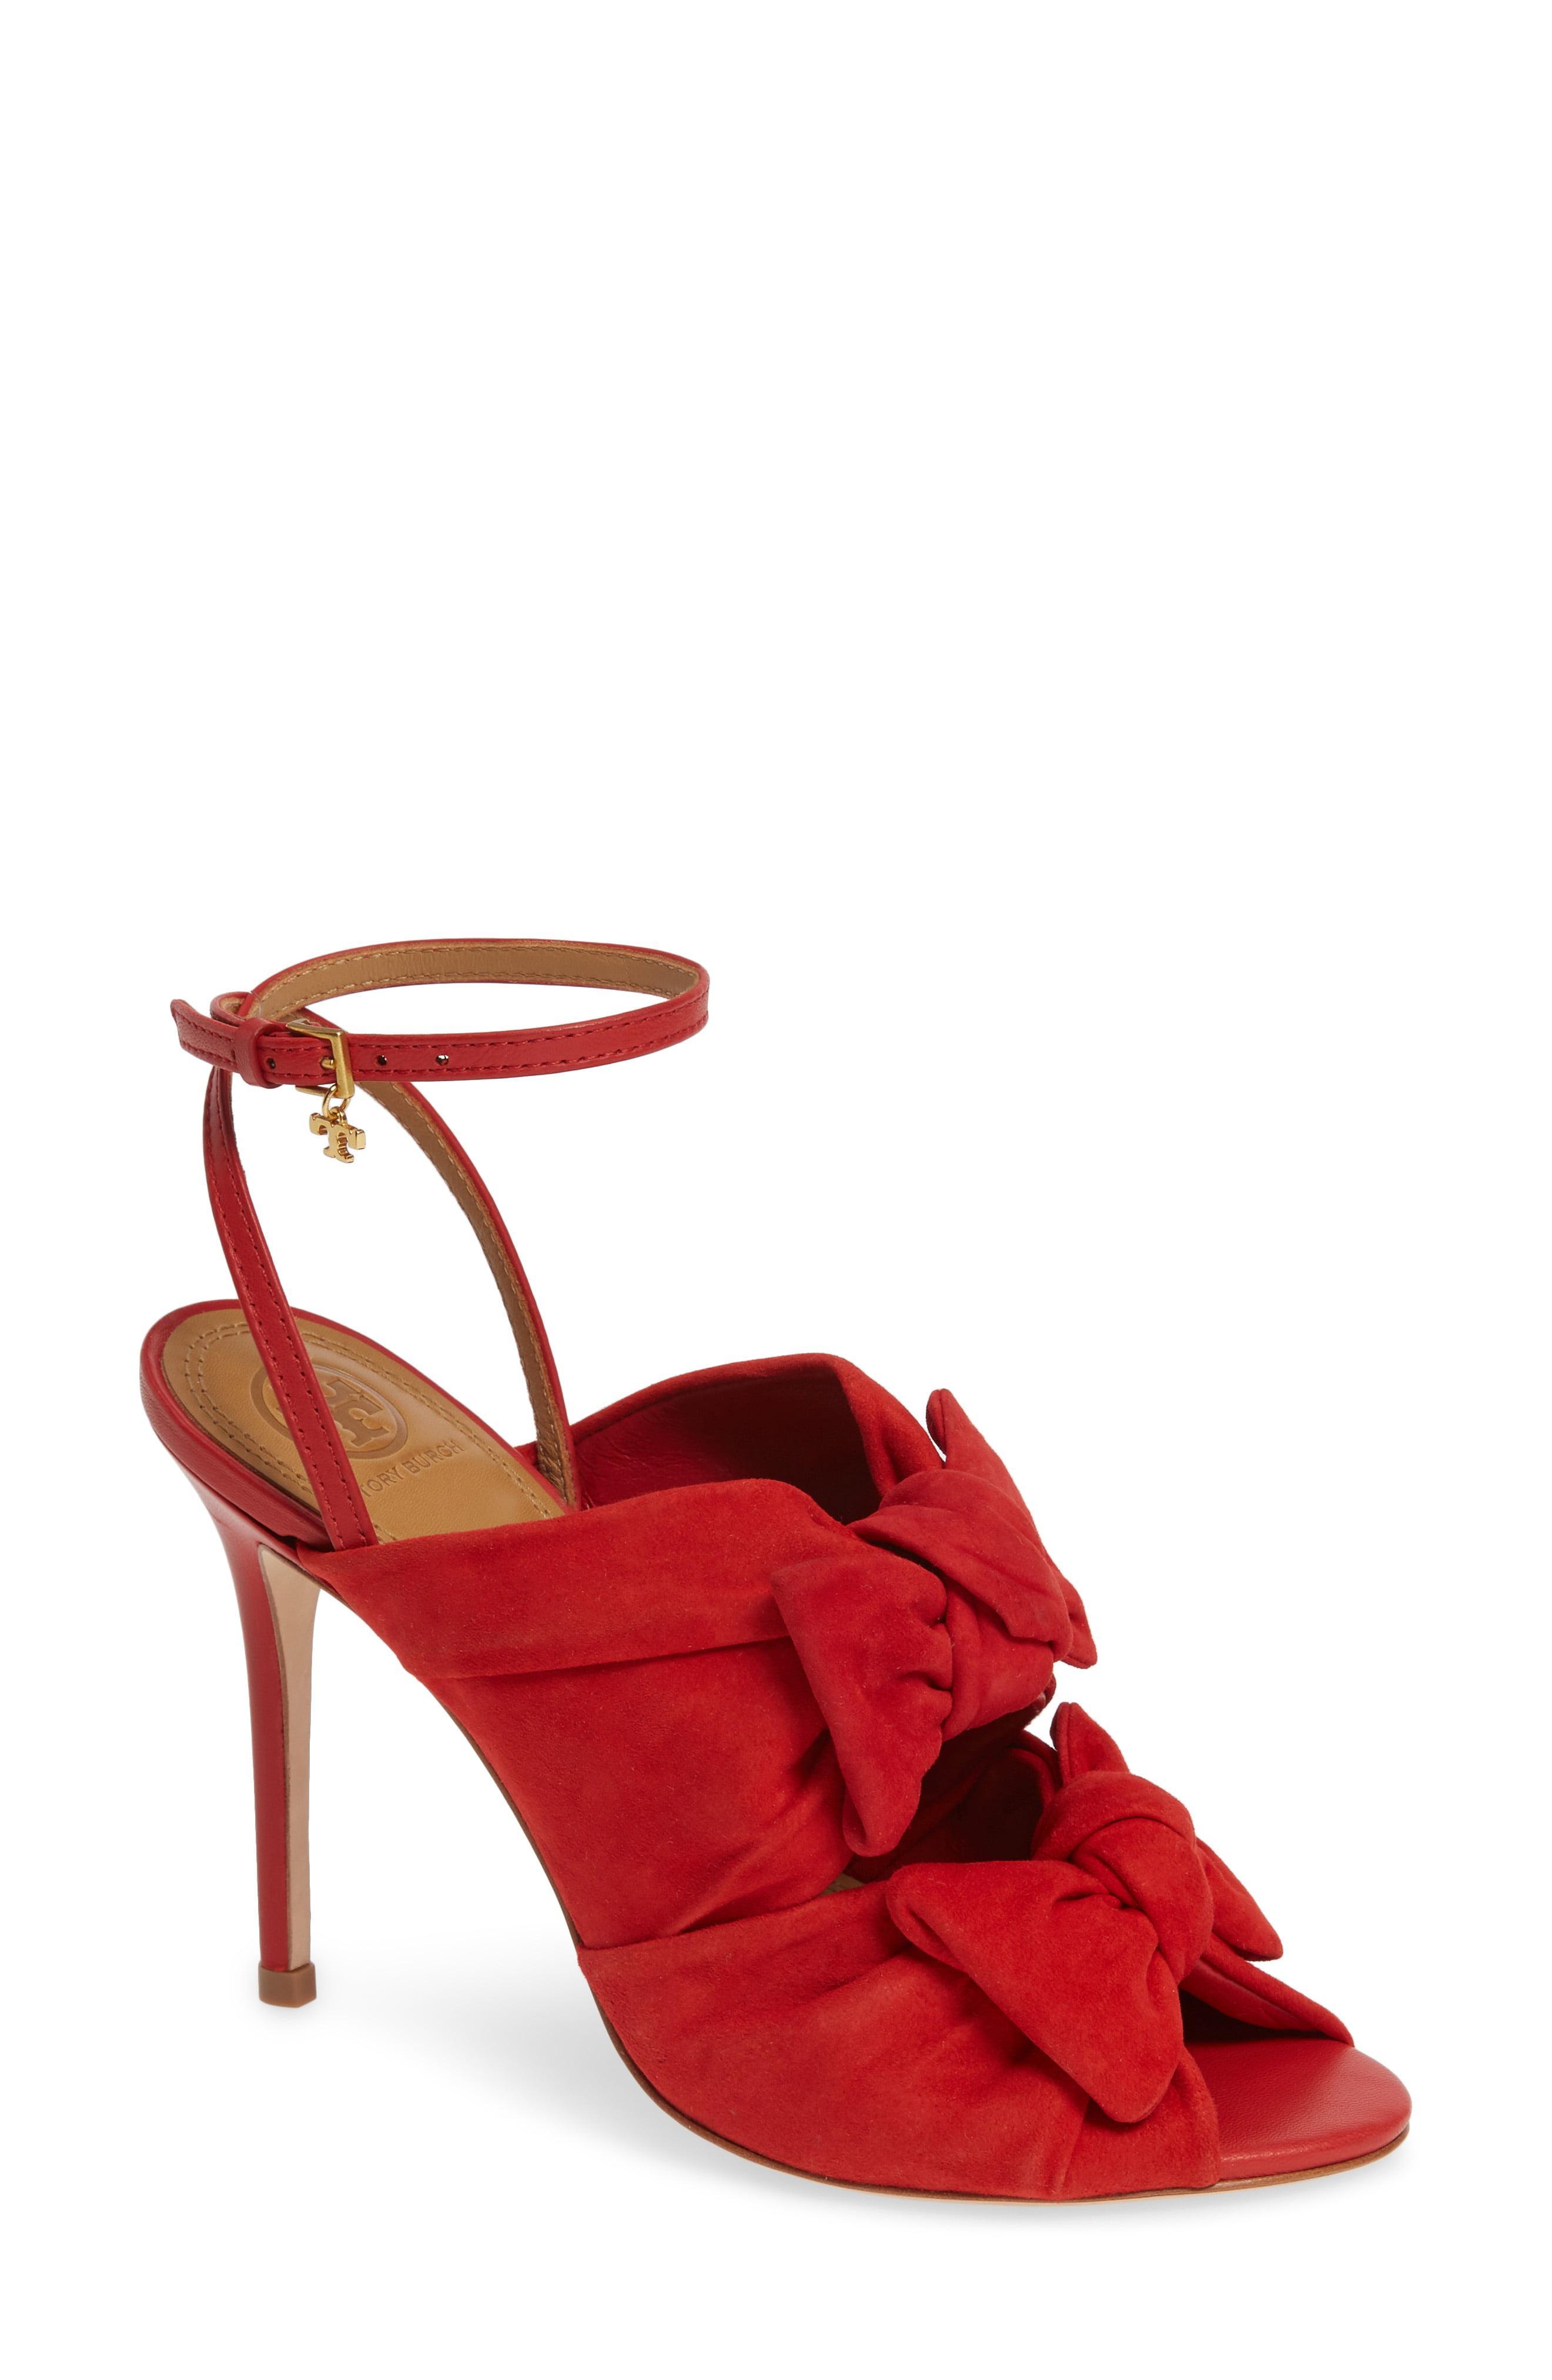 9c13520d6 Lyst - Tory Burch Eleanor Sandals in Red